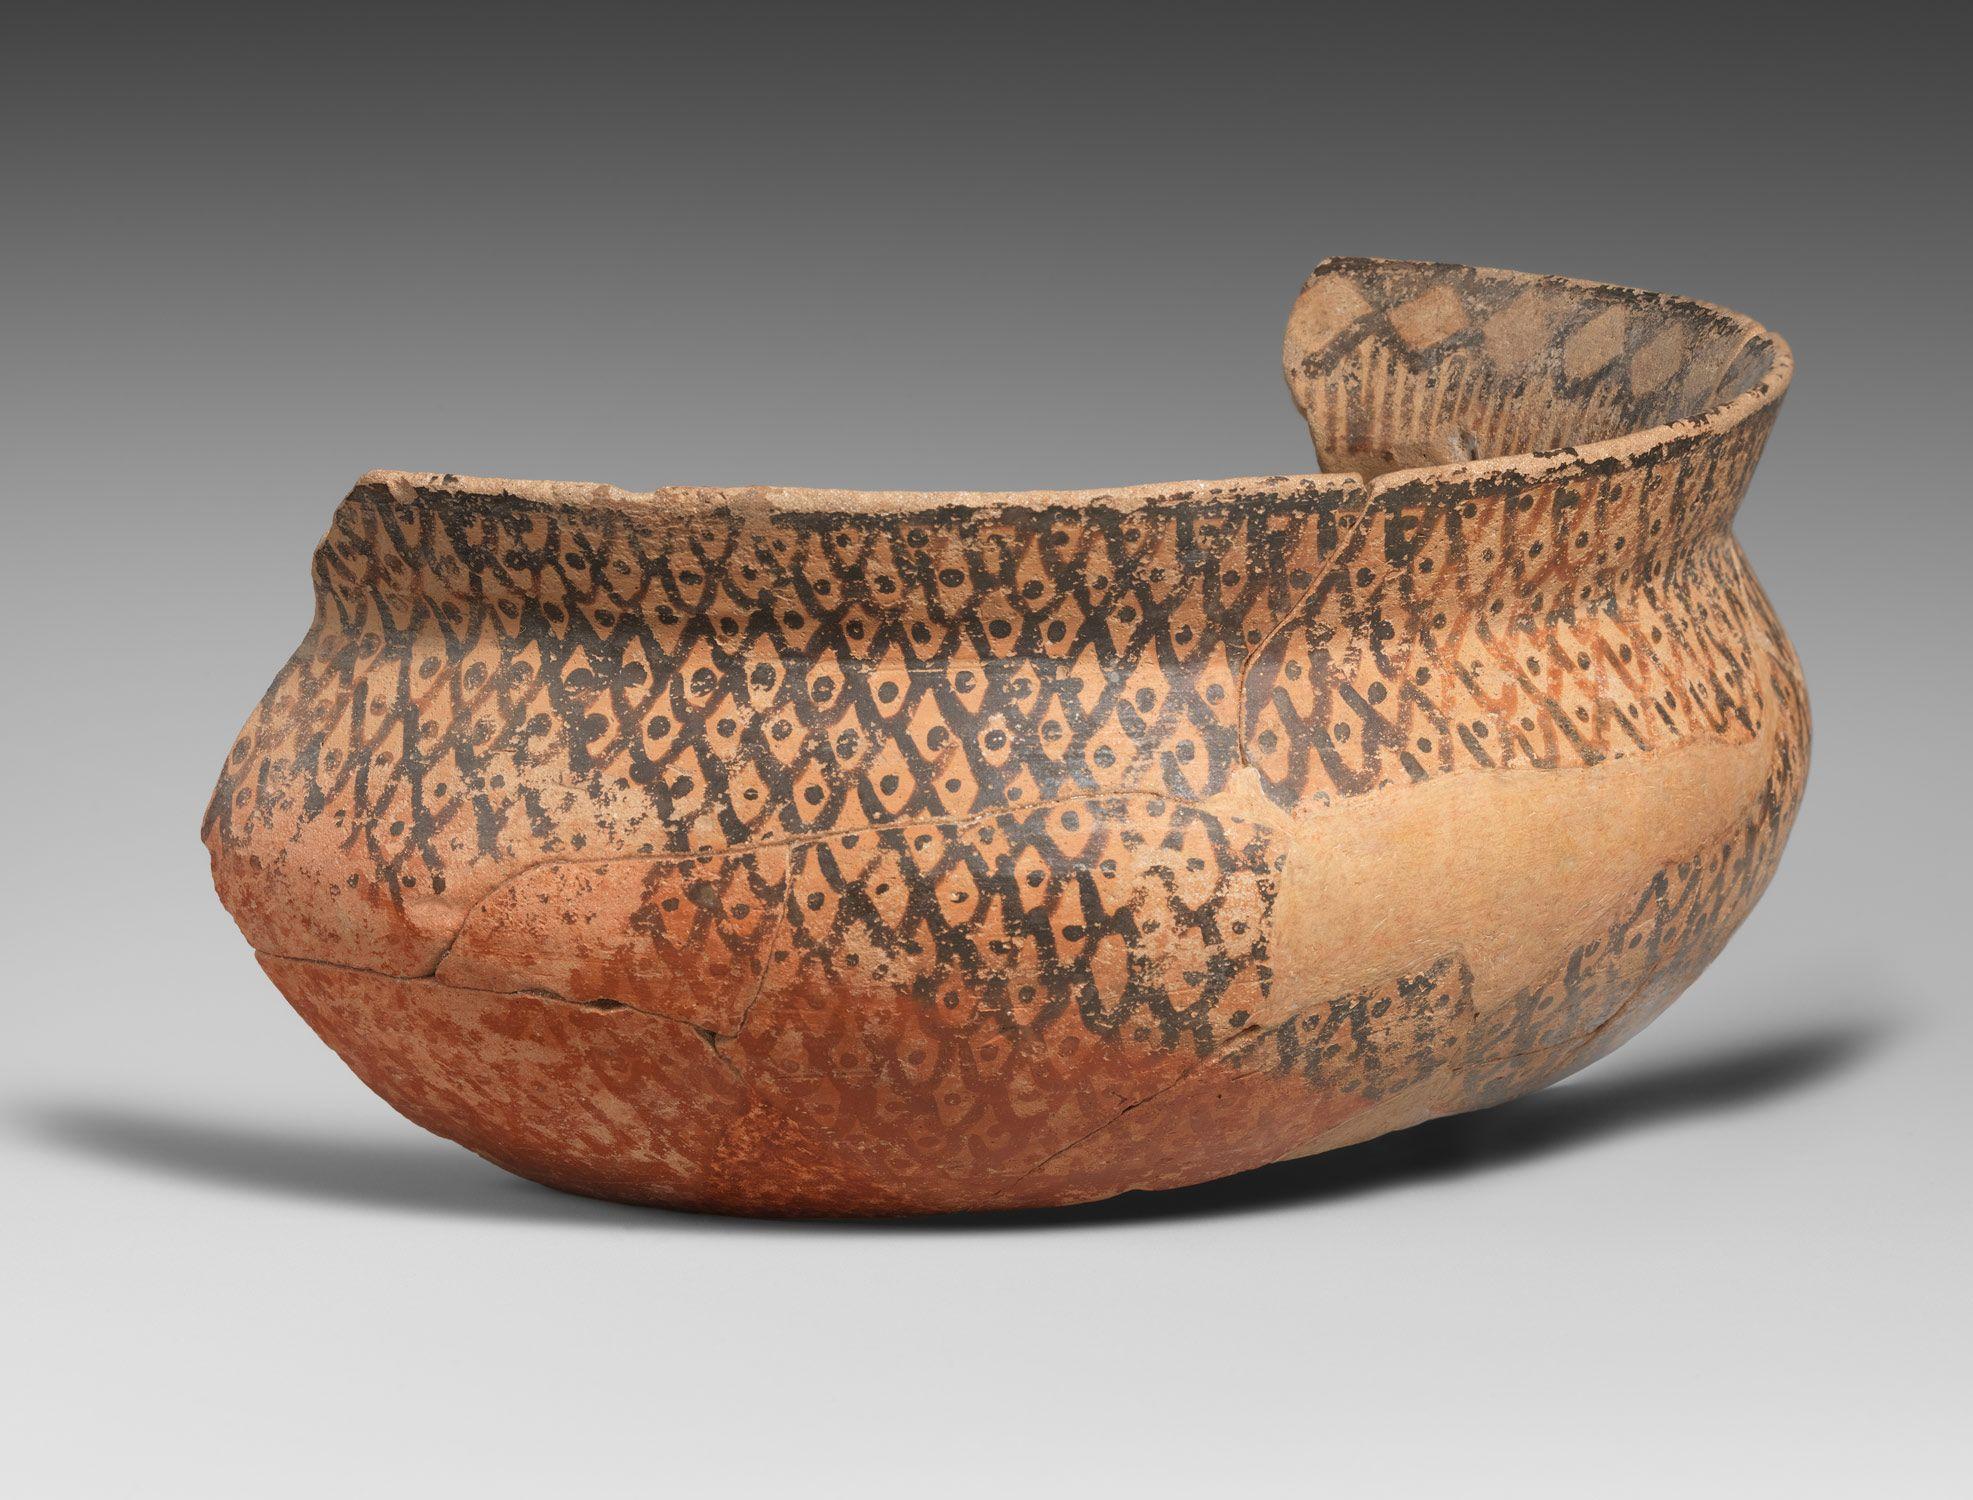 94 best cramique nolithique images on pinterest ceramic art bowl fragment period halaf date ca geography from syria tell halaf ancient guzana culture halaf medium ceramic dimensions in reviewsmspy